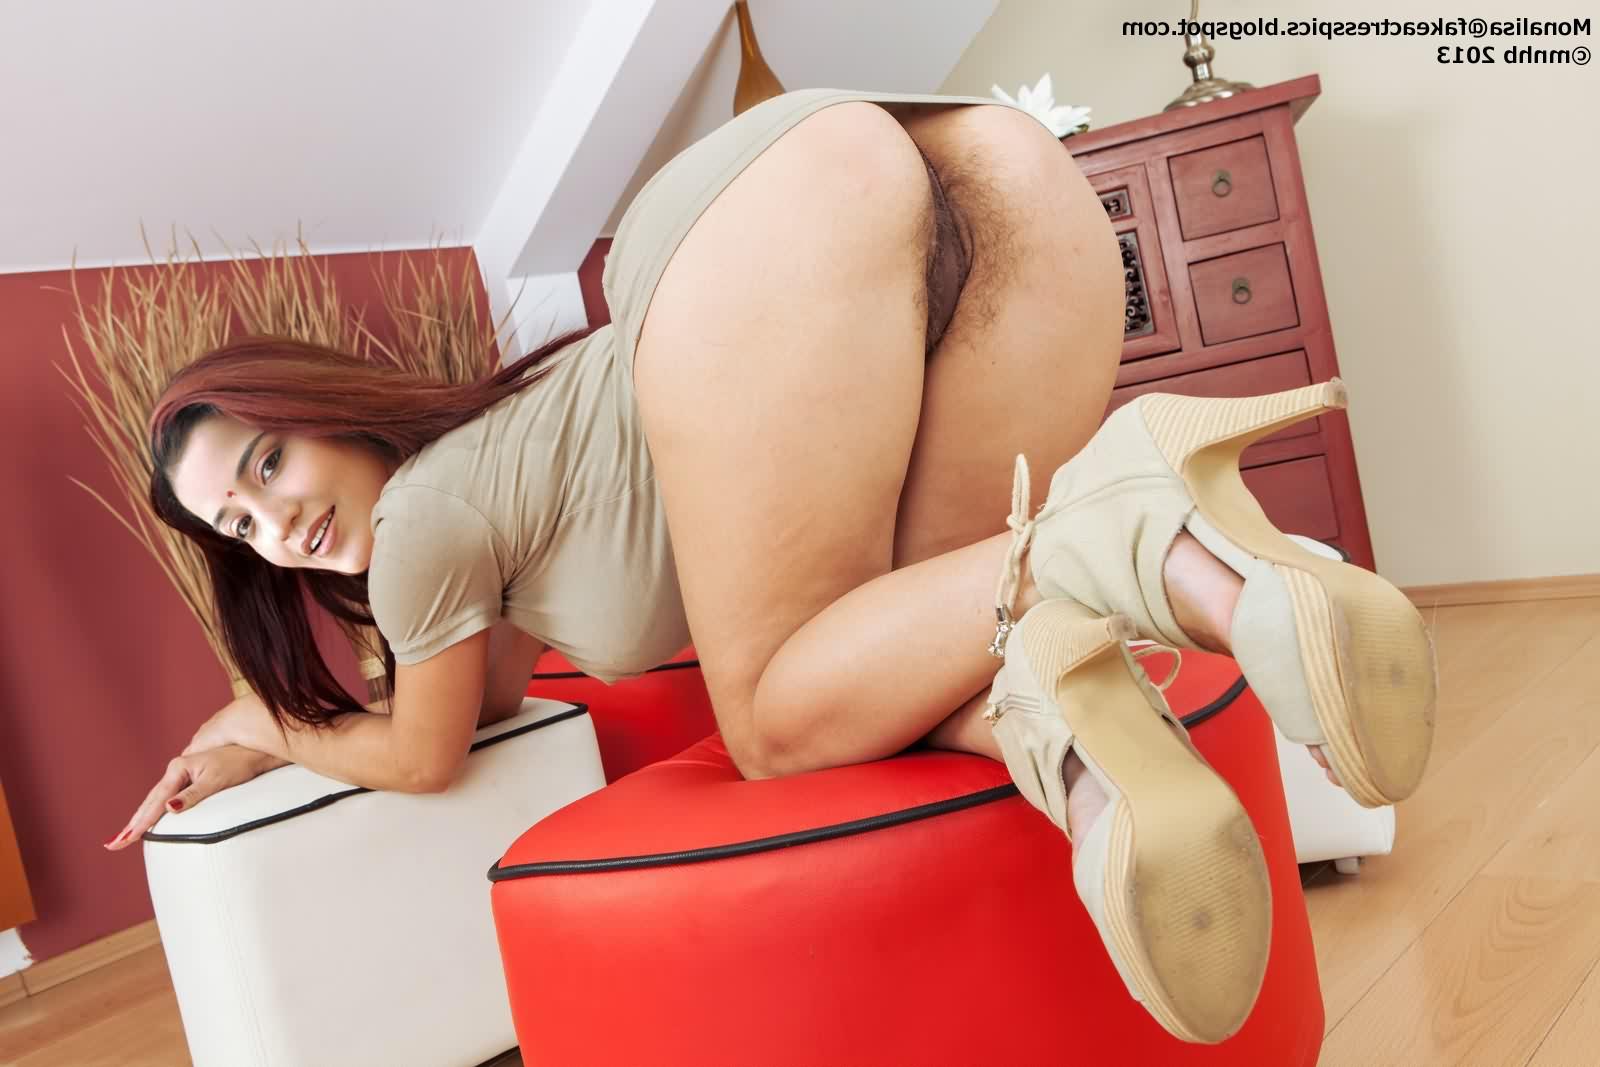 Monalisa nangi fake 2 - Mona Lisa Nude Bhojpuri Actress Naked pics